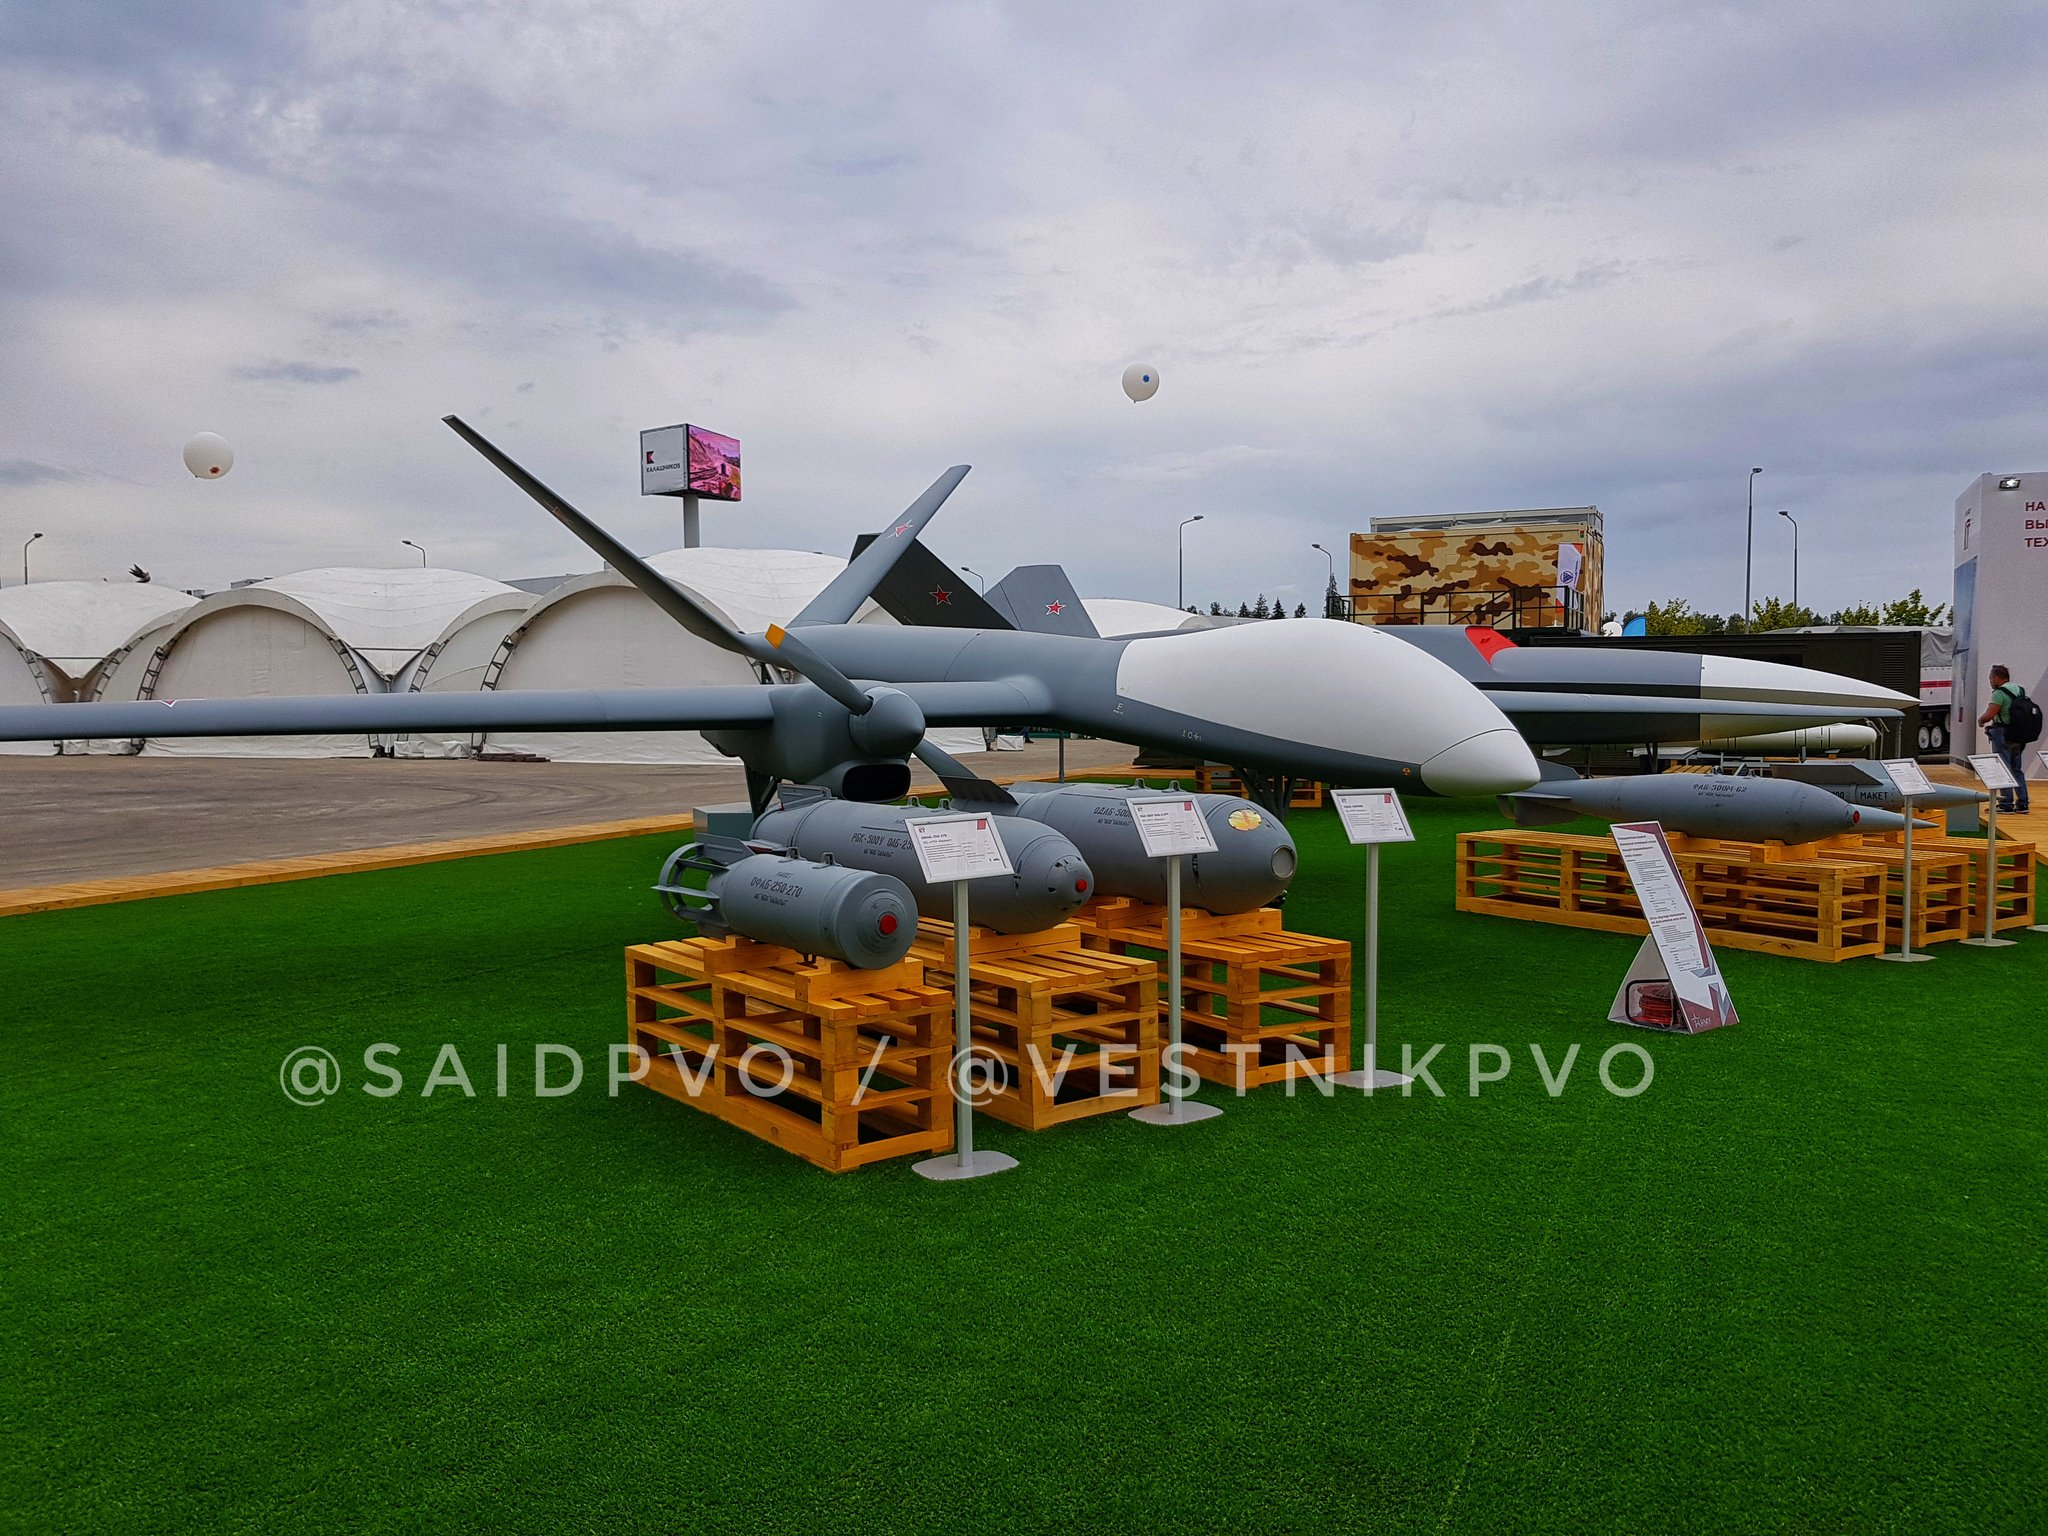 """ARMY 2020"" Military Technical Forum EgLMTUGXkAIc3Q2?format=jpg&name=large"